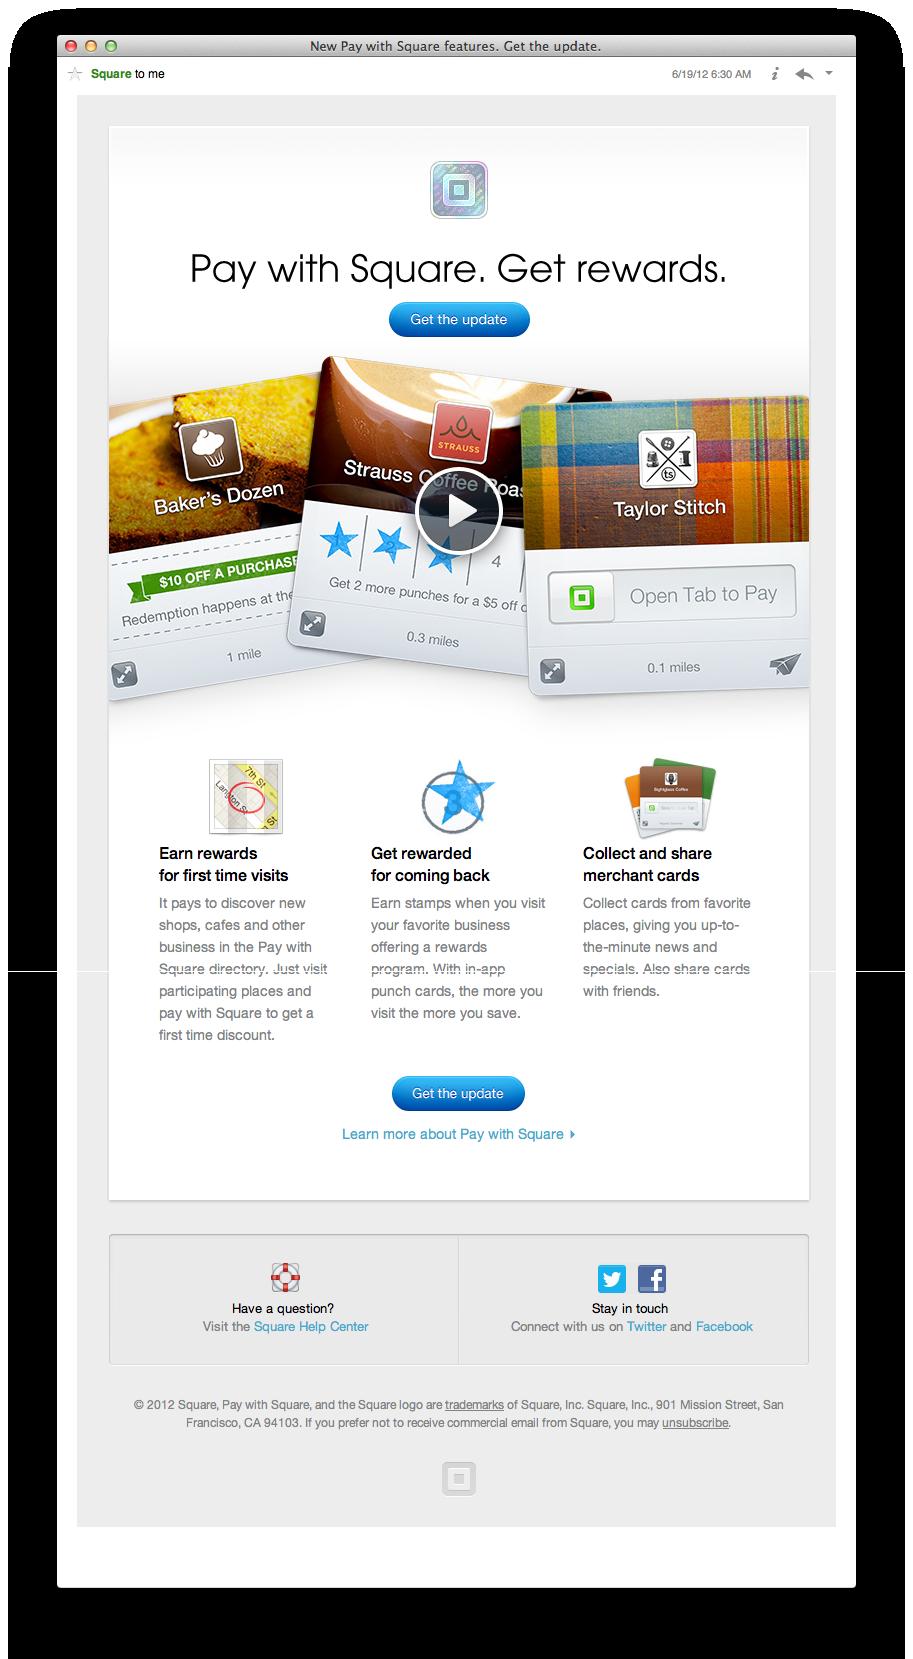 Square Pay With Square Get Rewards Web Design Rewards Earn Rewards